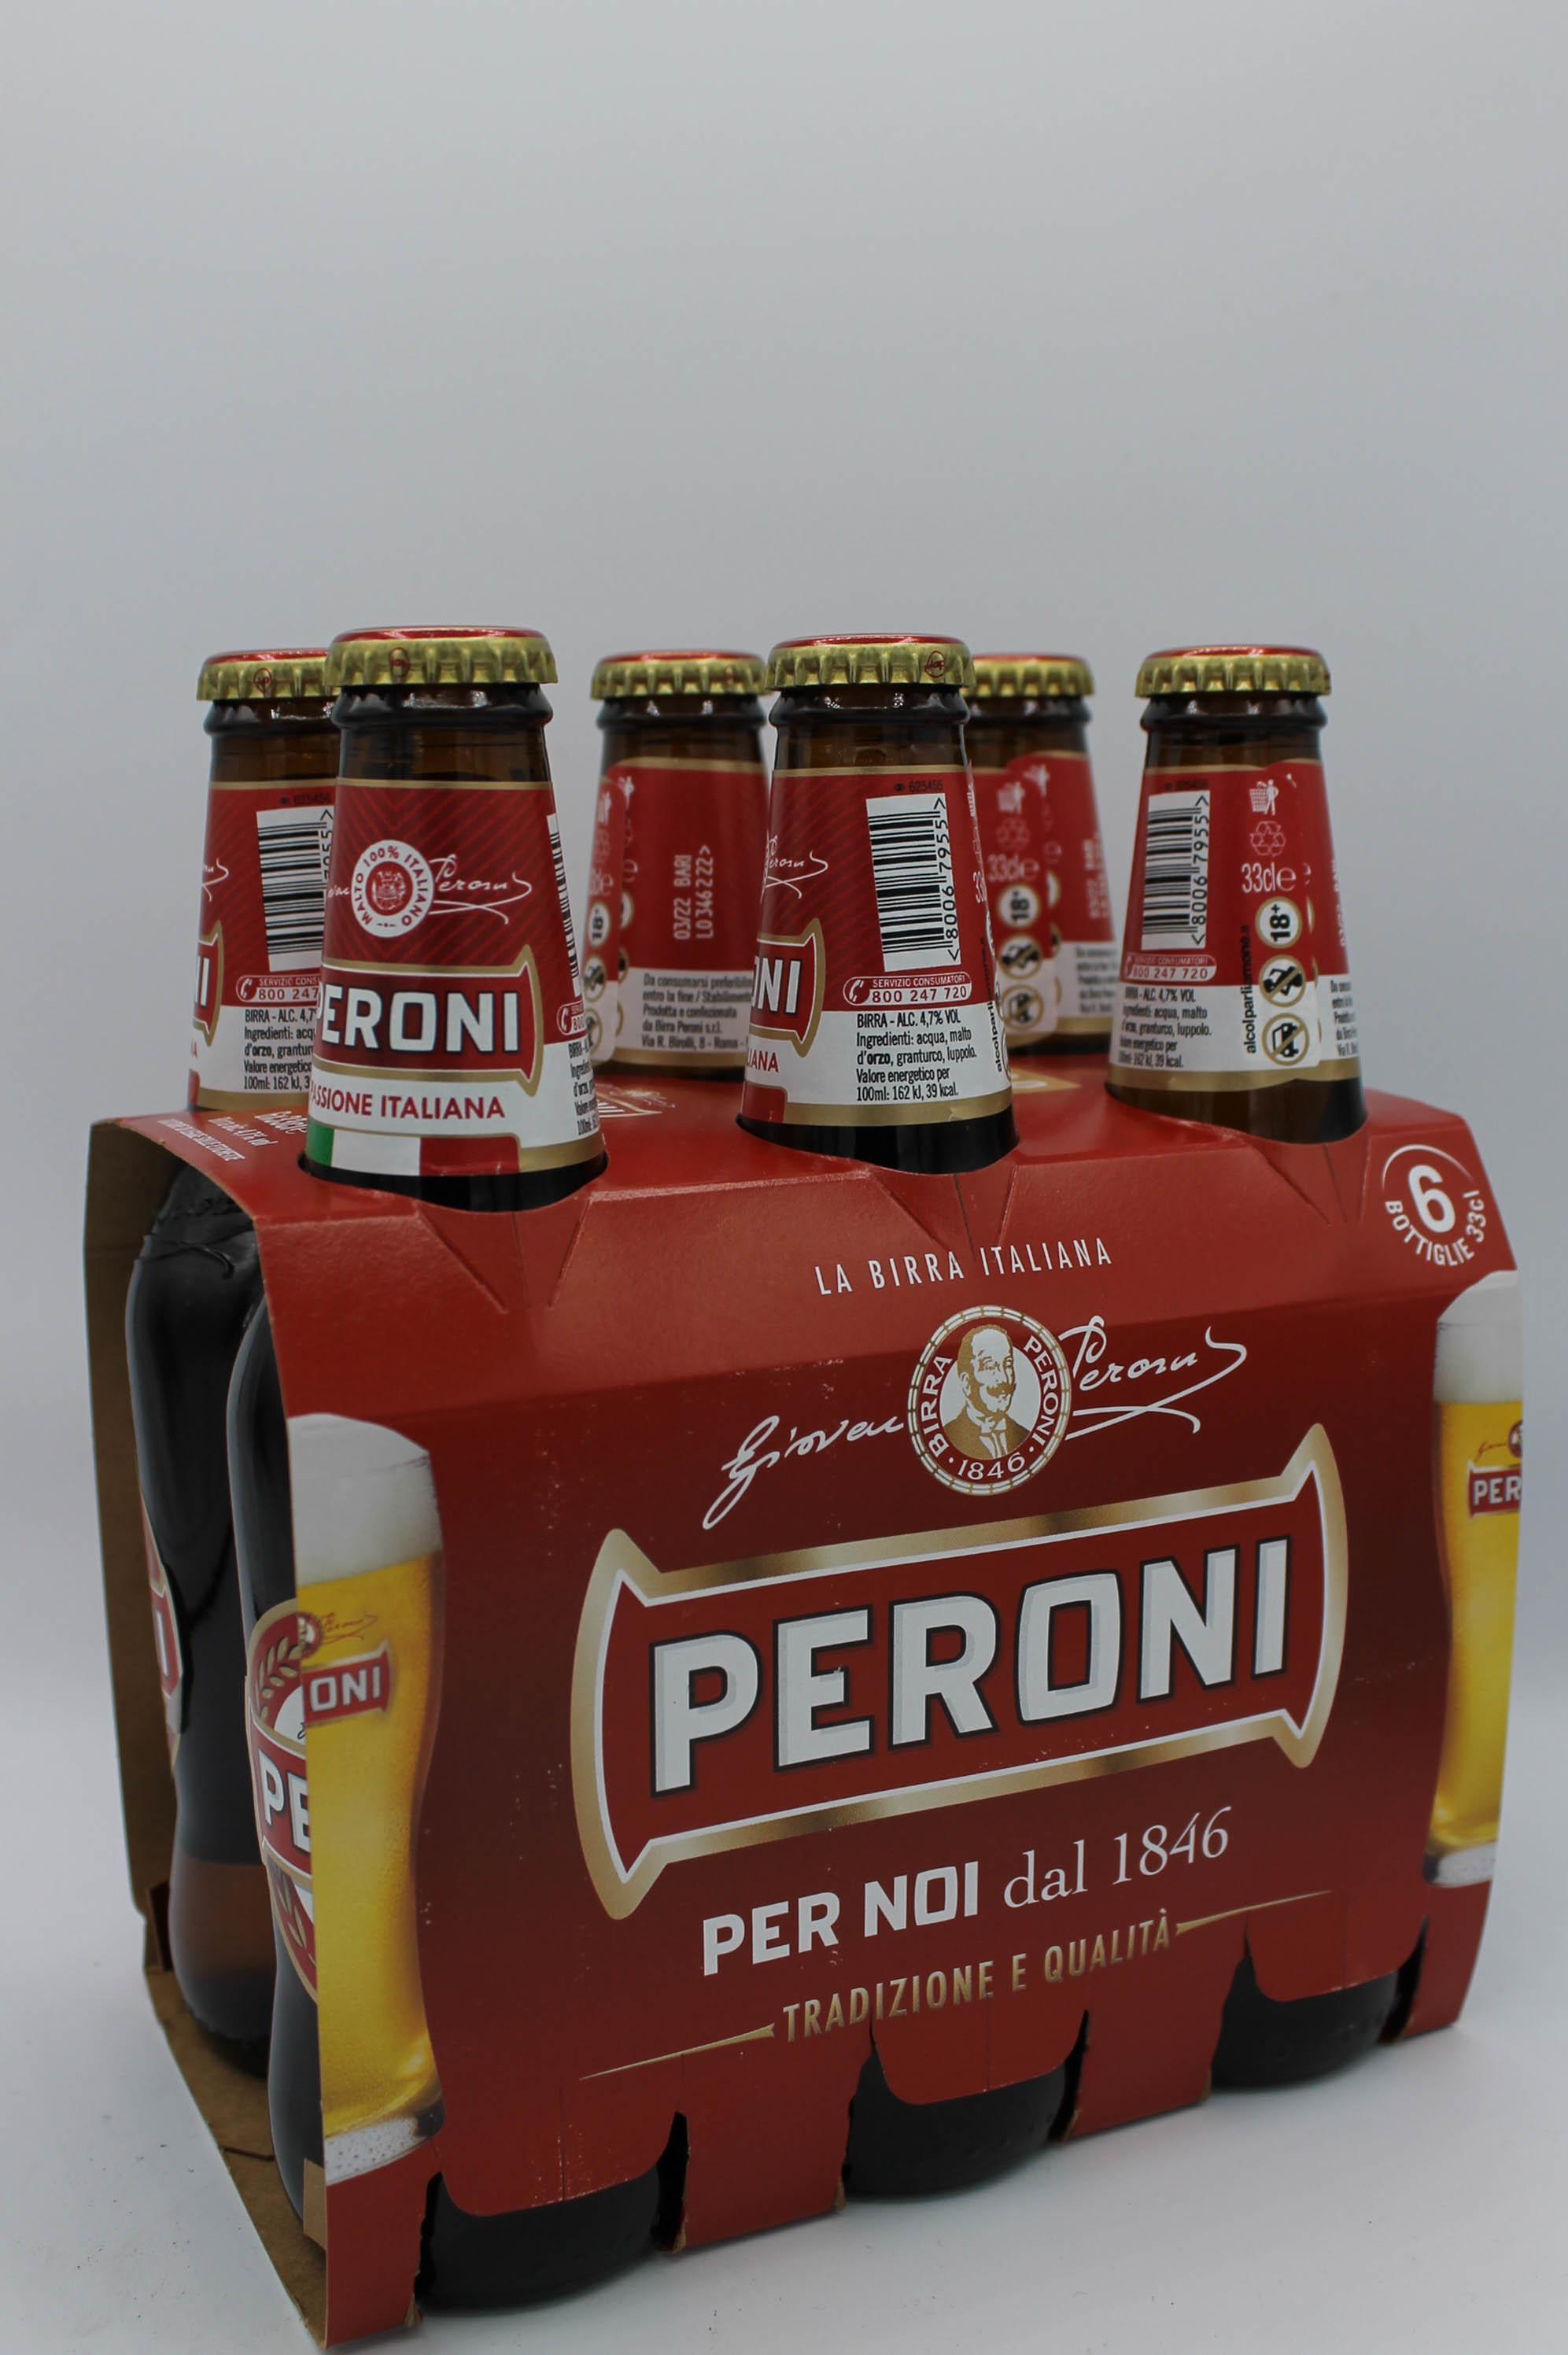 Peroni birra bottiglia 6x330ml.